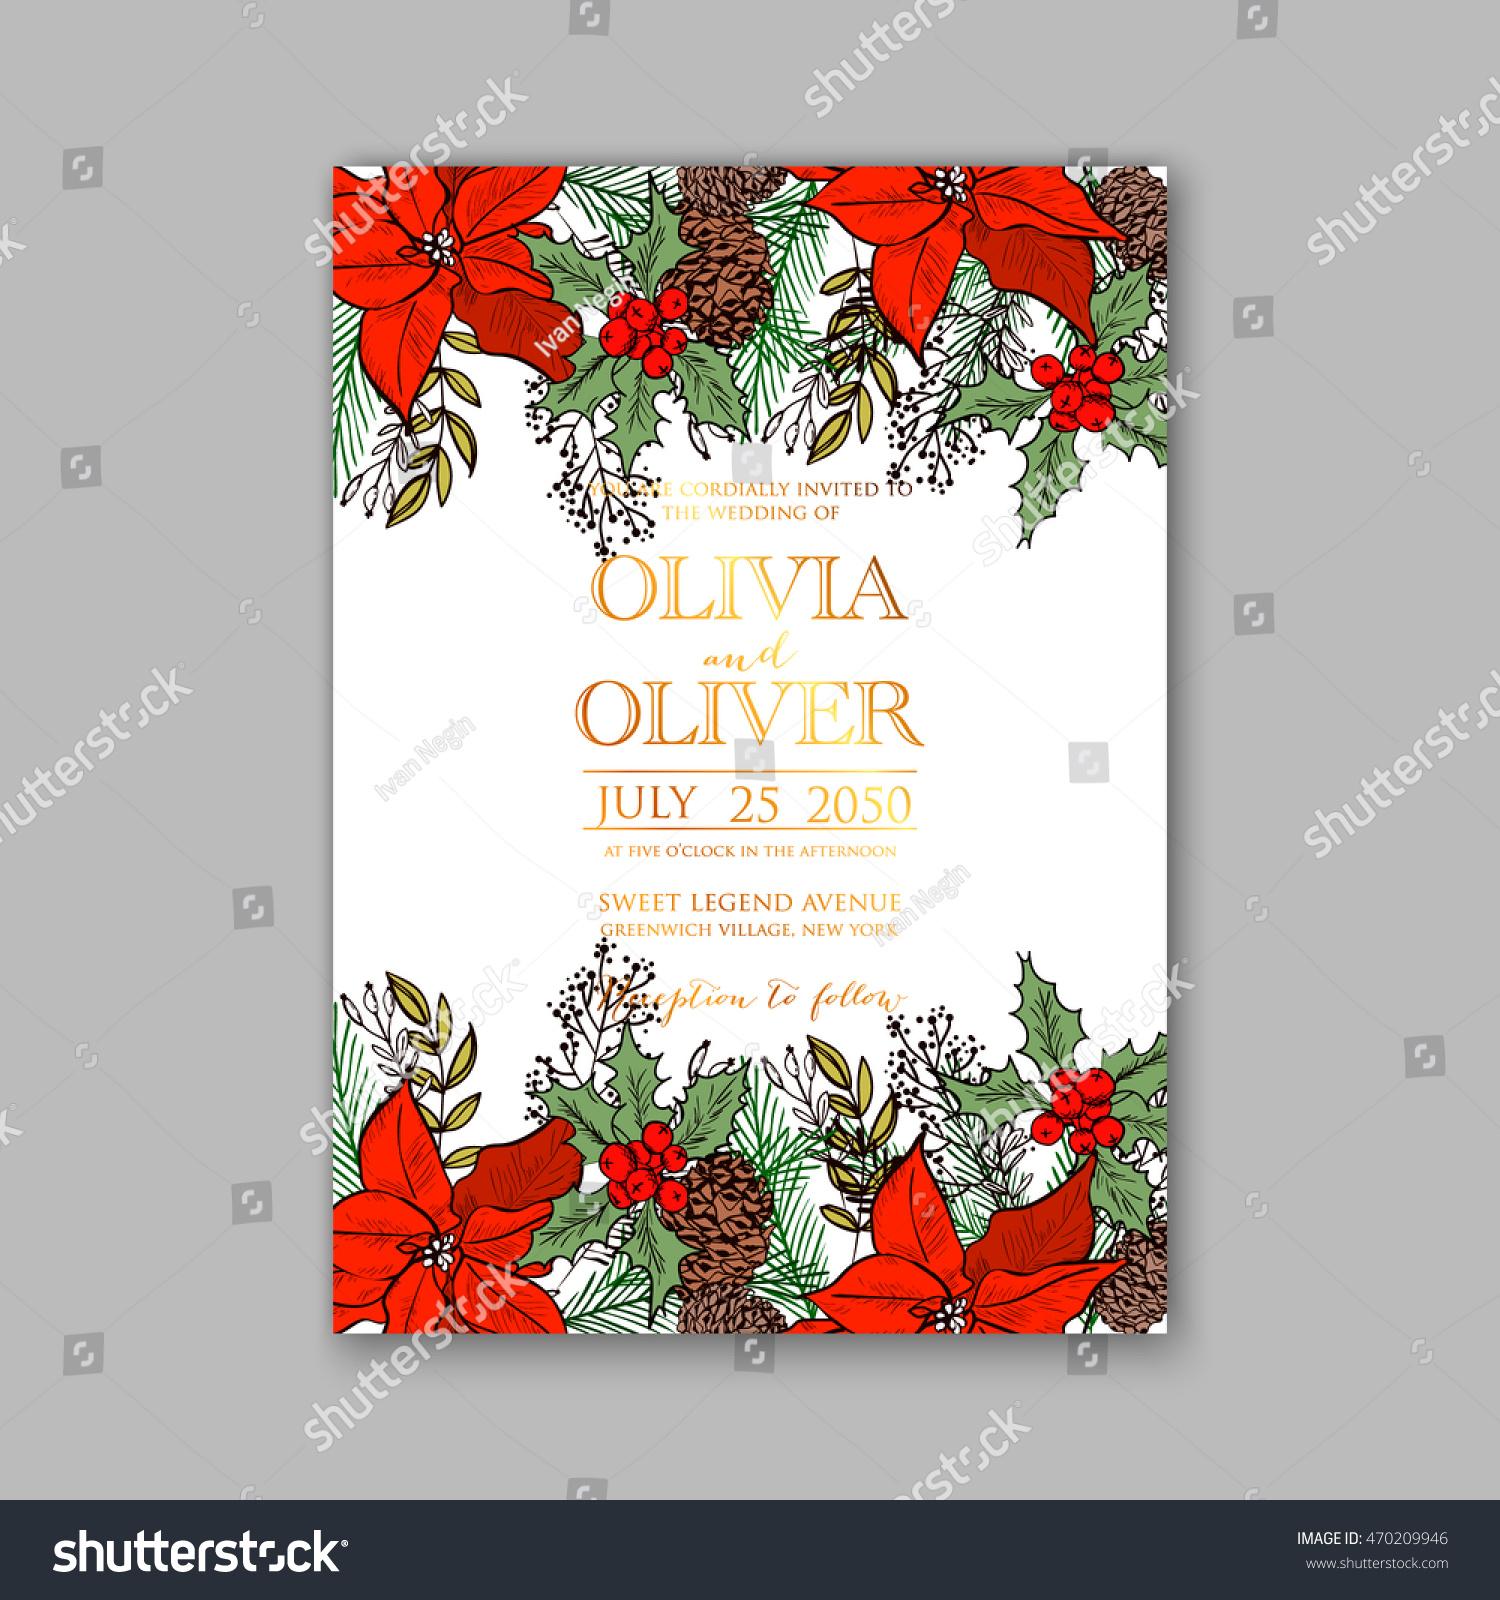 Floral Wedding Invitation Winter Christmas Wreath Stock Vector ...